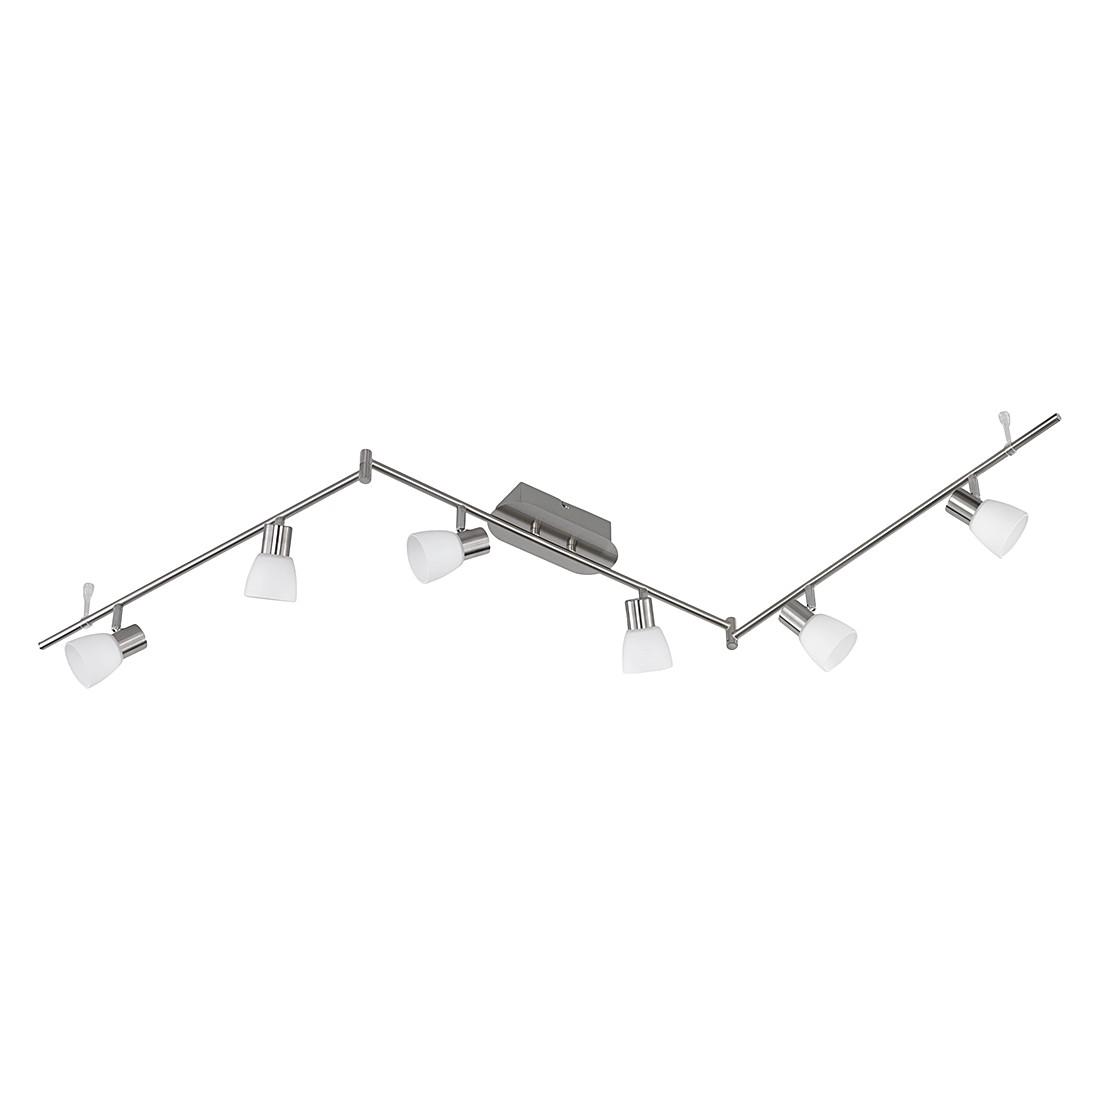 EEK A+, Luminaire LED - Nickel 6 x 4,5 watts, Trio